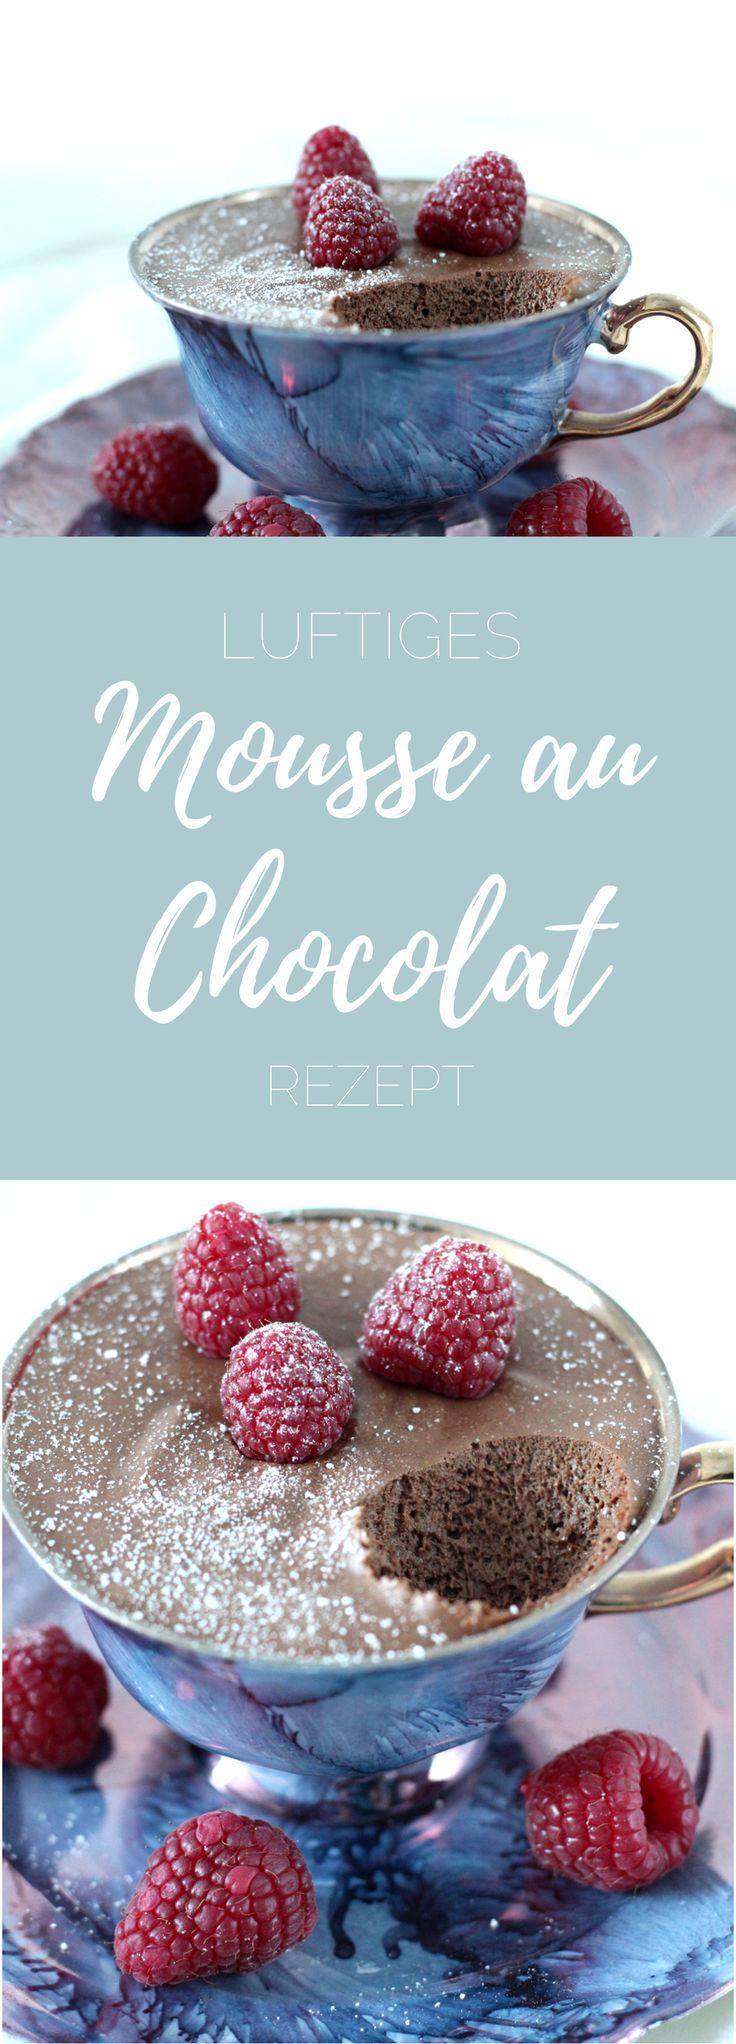 {kitchen stories} Luftiges Mousse au Chocolat - selbst gemacht! - michilicious